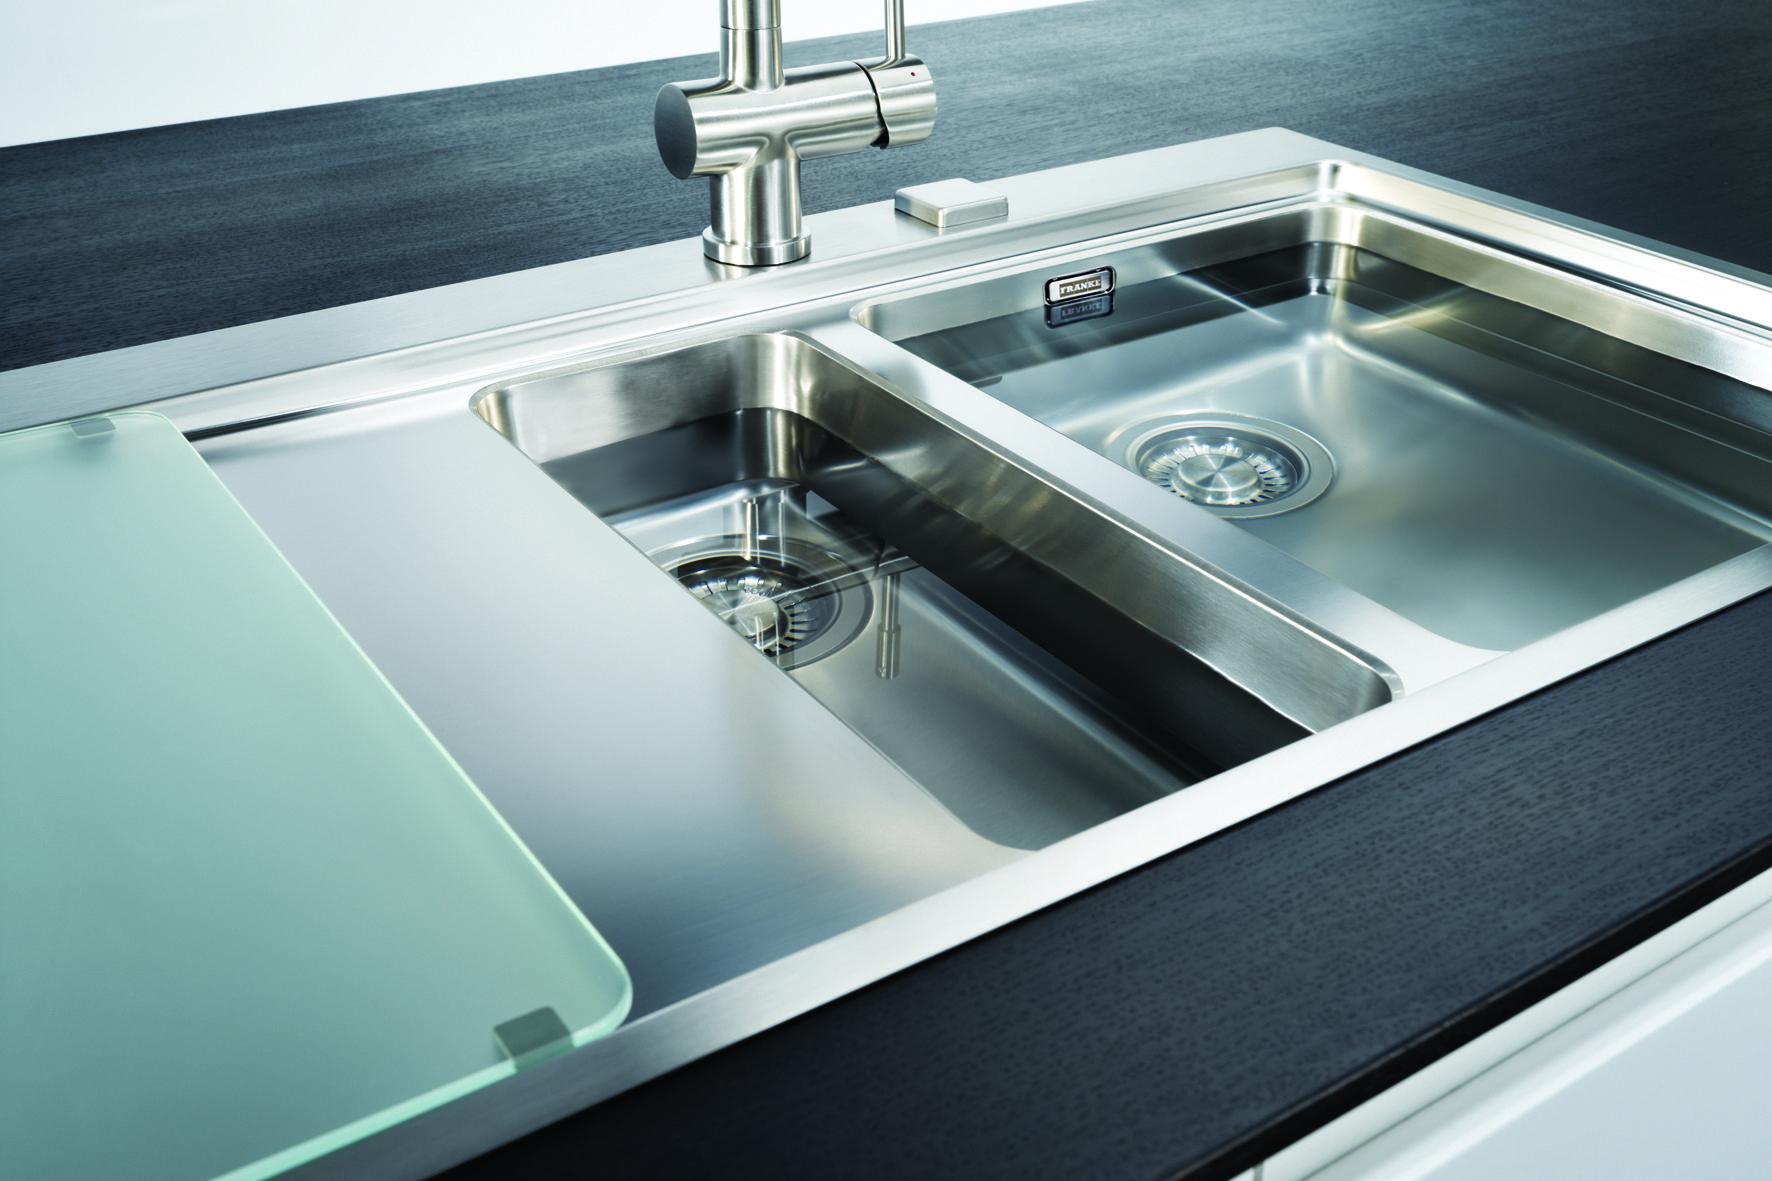 Franke sink- inspirational design | Kitchen sink taps, Sink ...